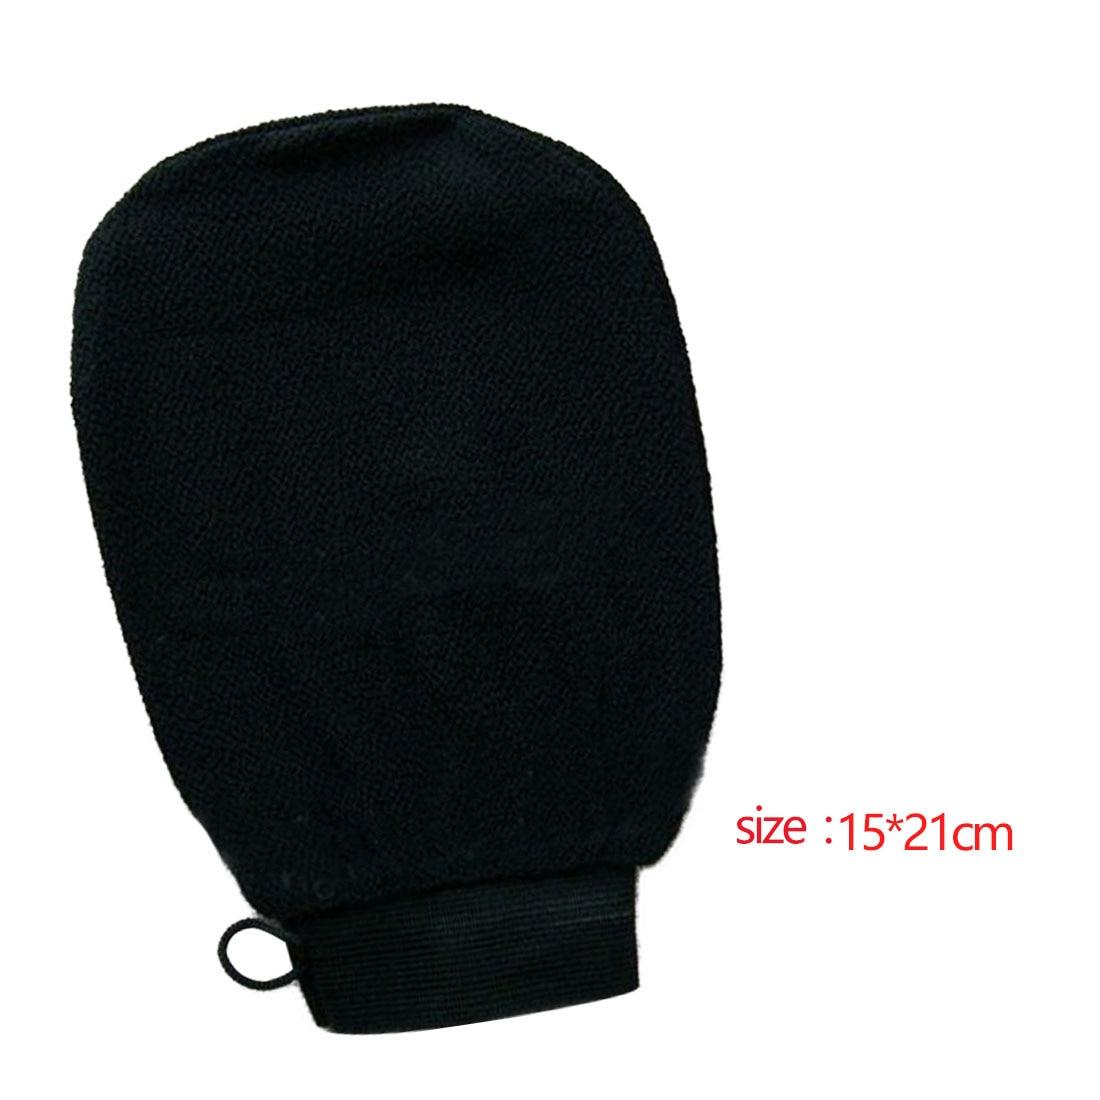 Good Quality 1 PC Magic Black Exfoliator Bath Glove Body Cleaning Scrub Mitt Rub Dead Skin Removal Shower Spa Massage